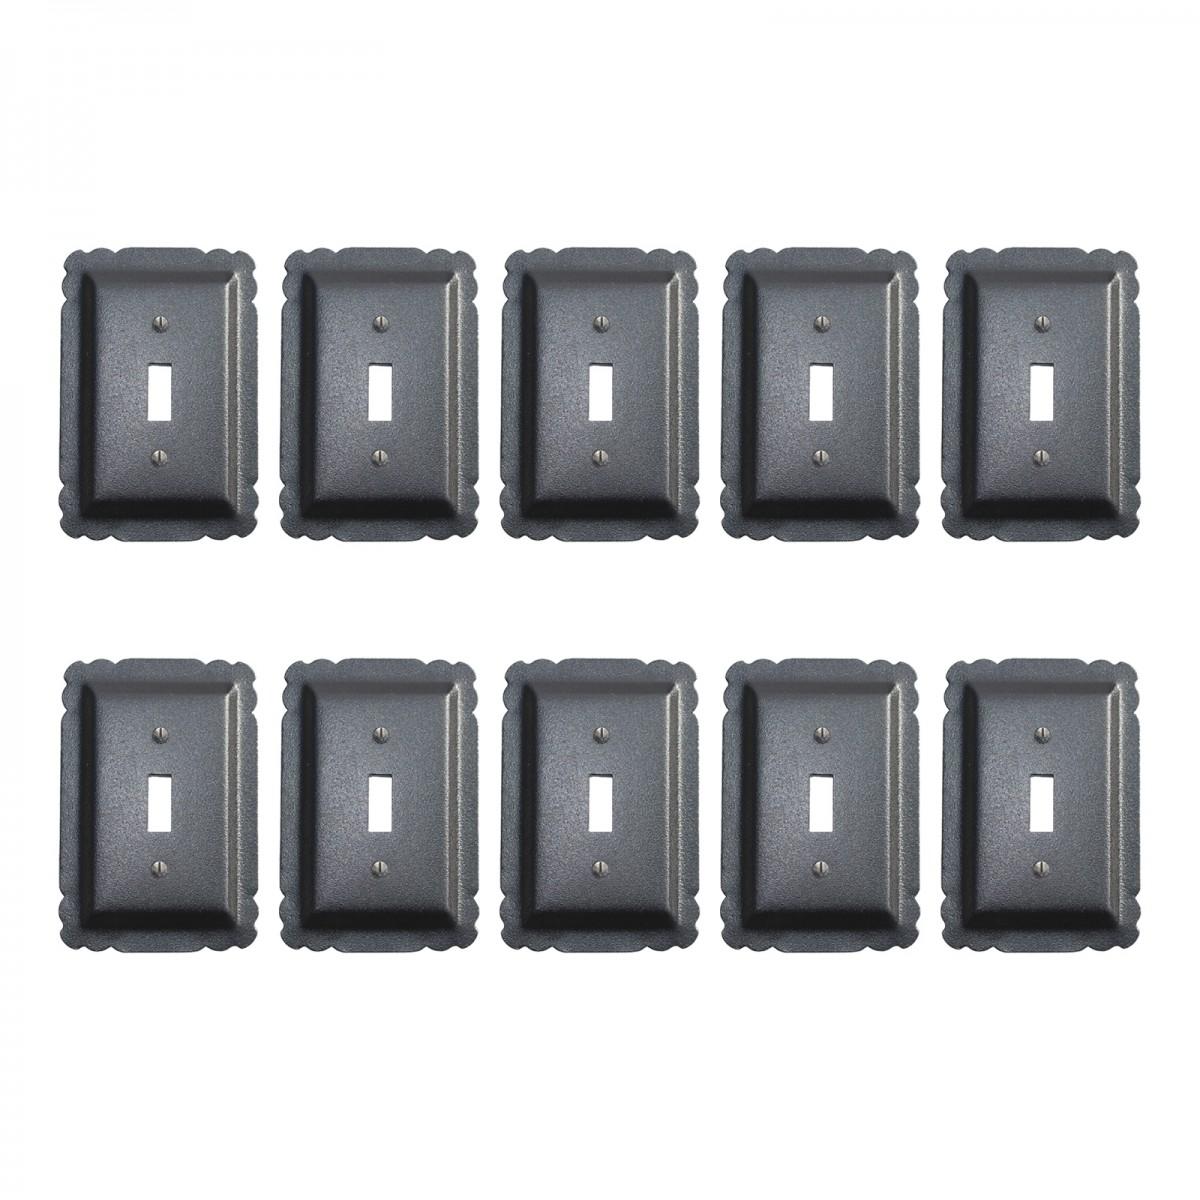 10 Switchplate Black Steel Single Toggle    Renovators Supply